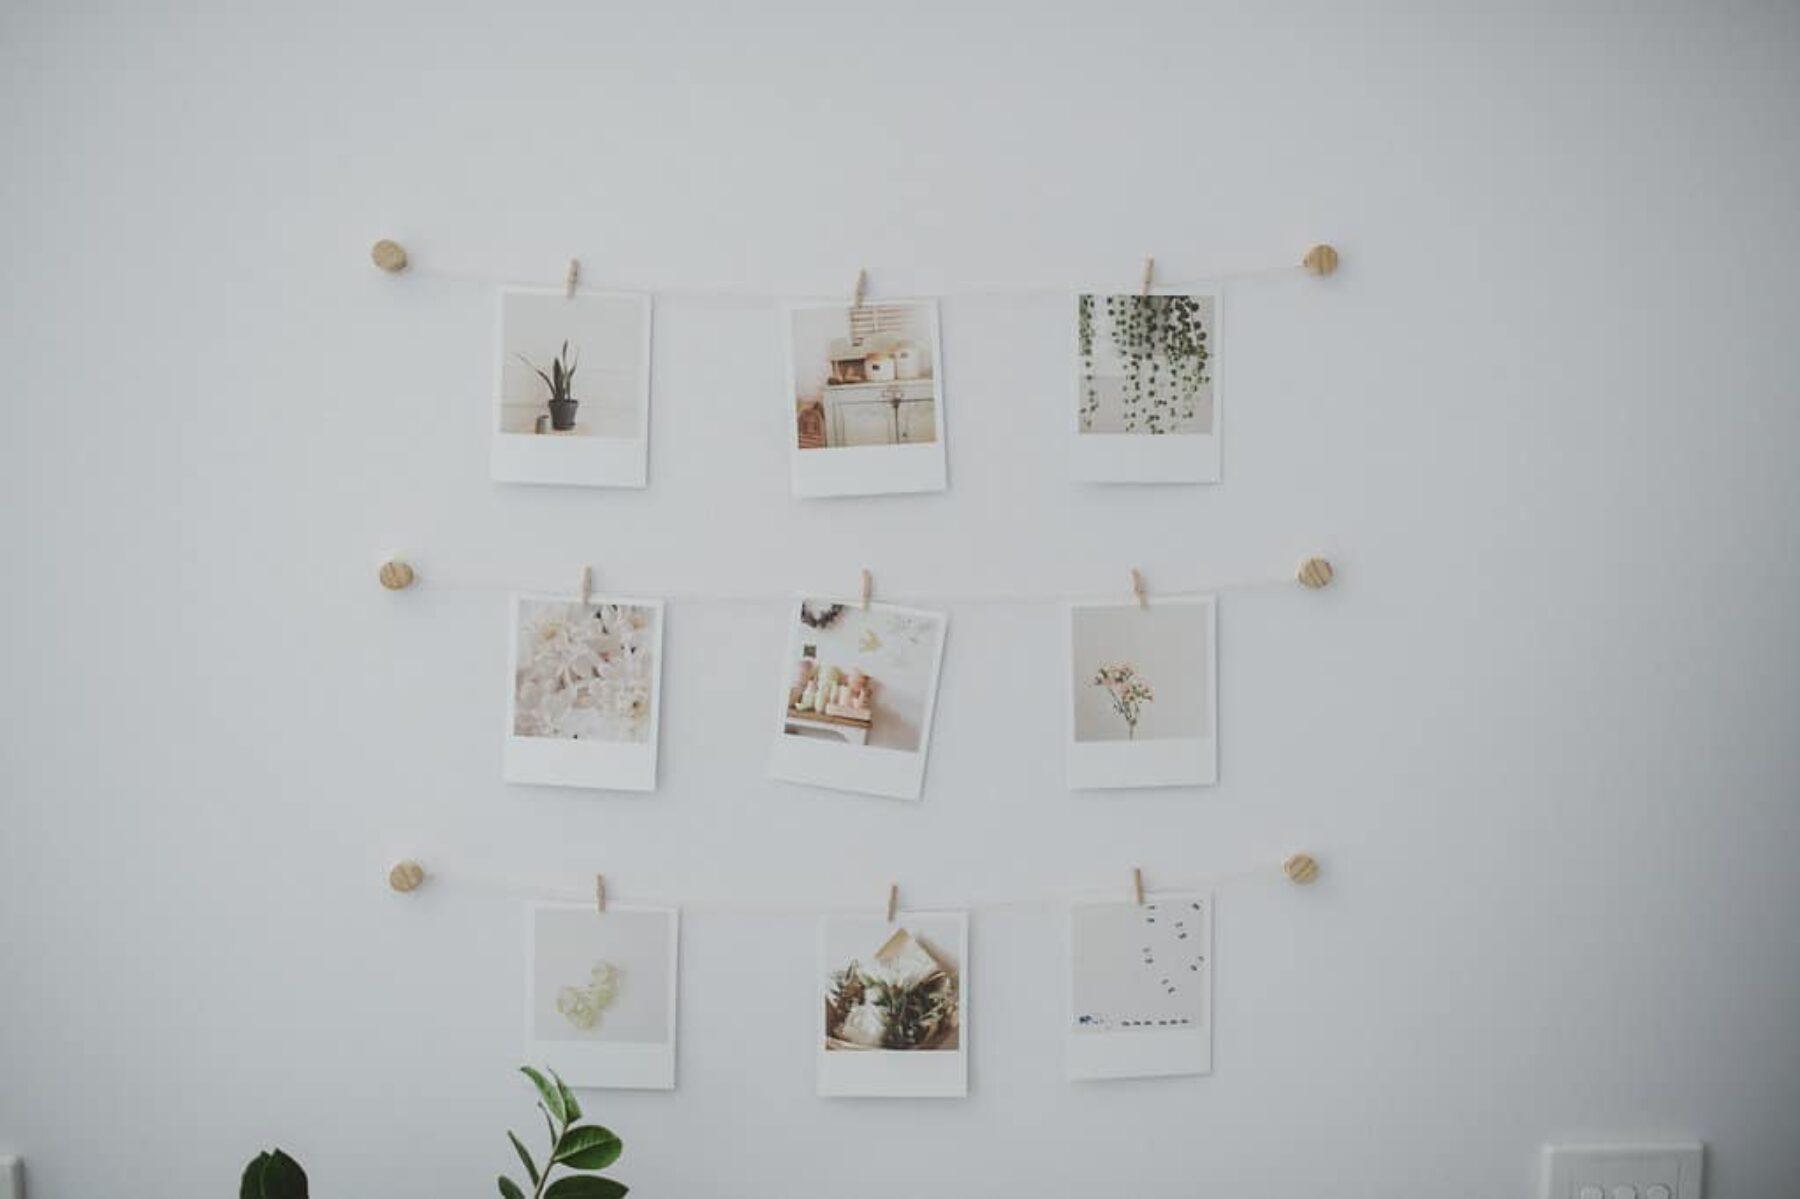 pegged polaroid wall display